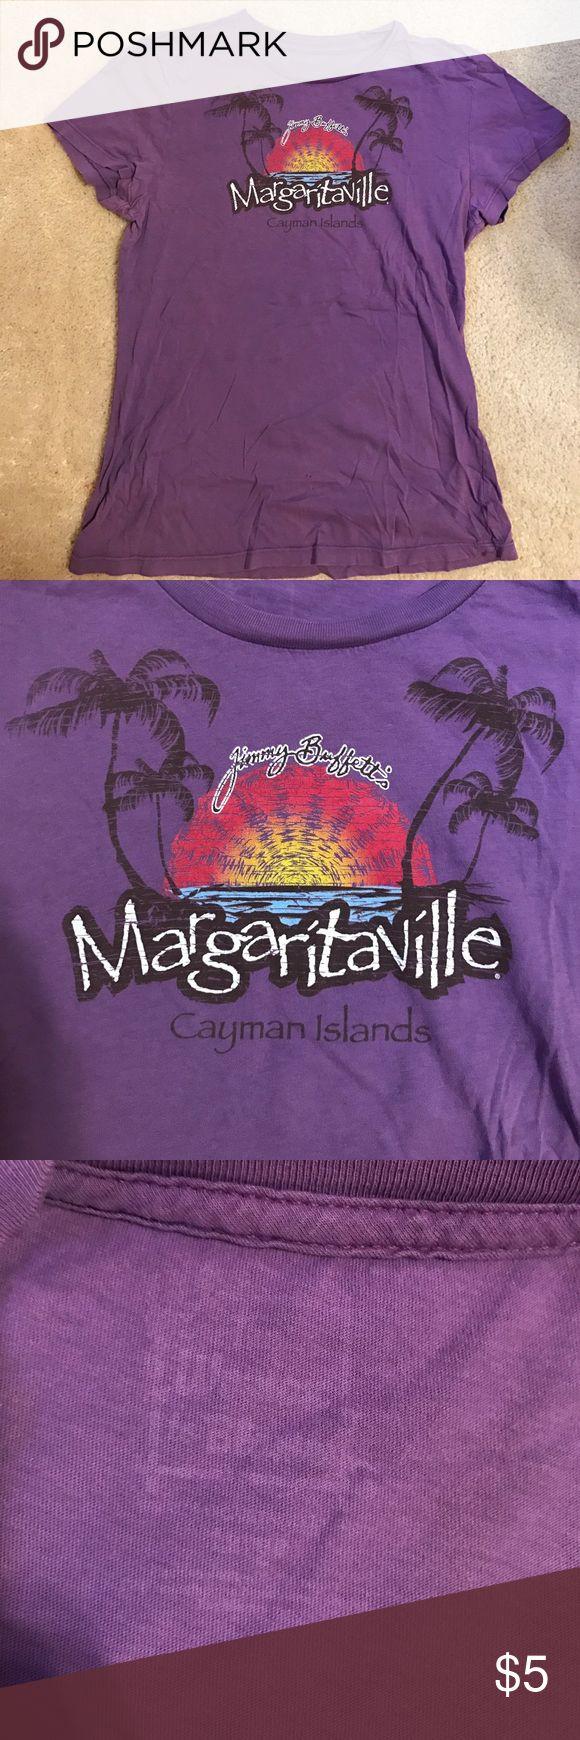 Margaritaville Cayman Islands purple women's t Margaritaville Cayman Islands purple women's t Tops Tees - Short Sleeve